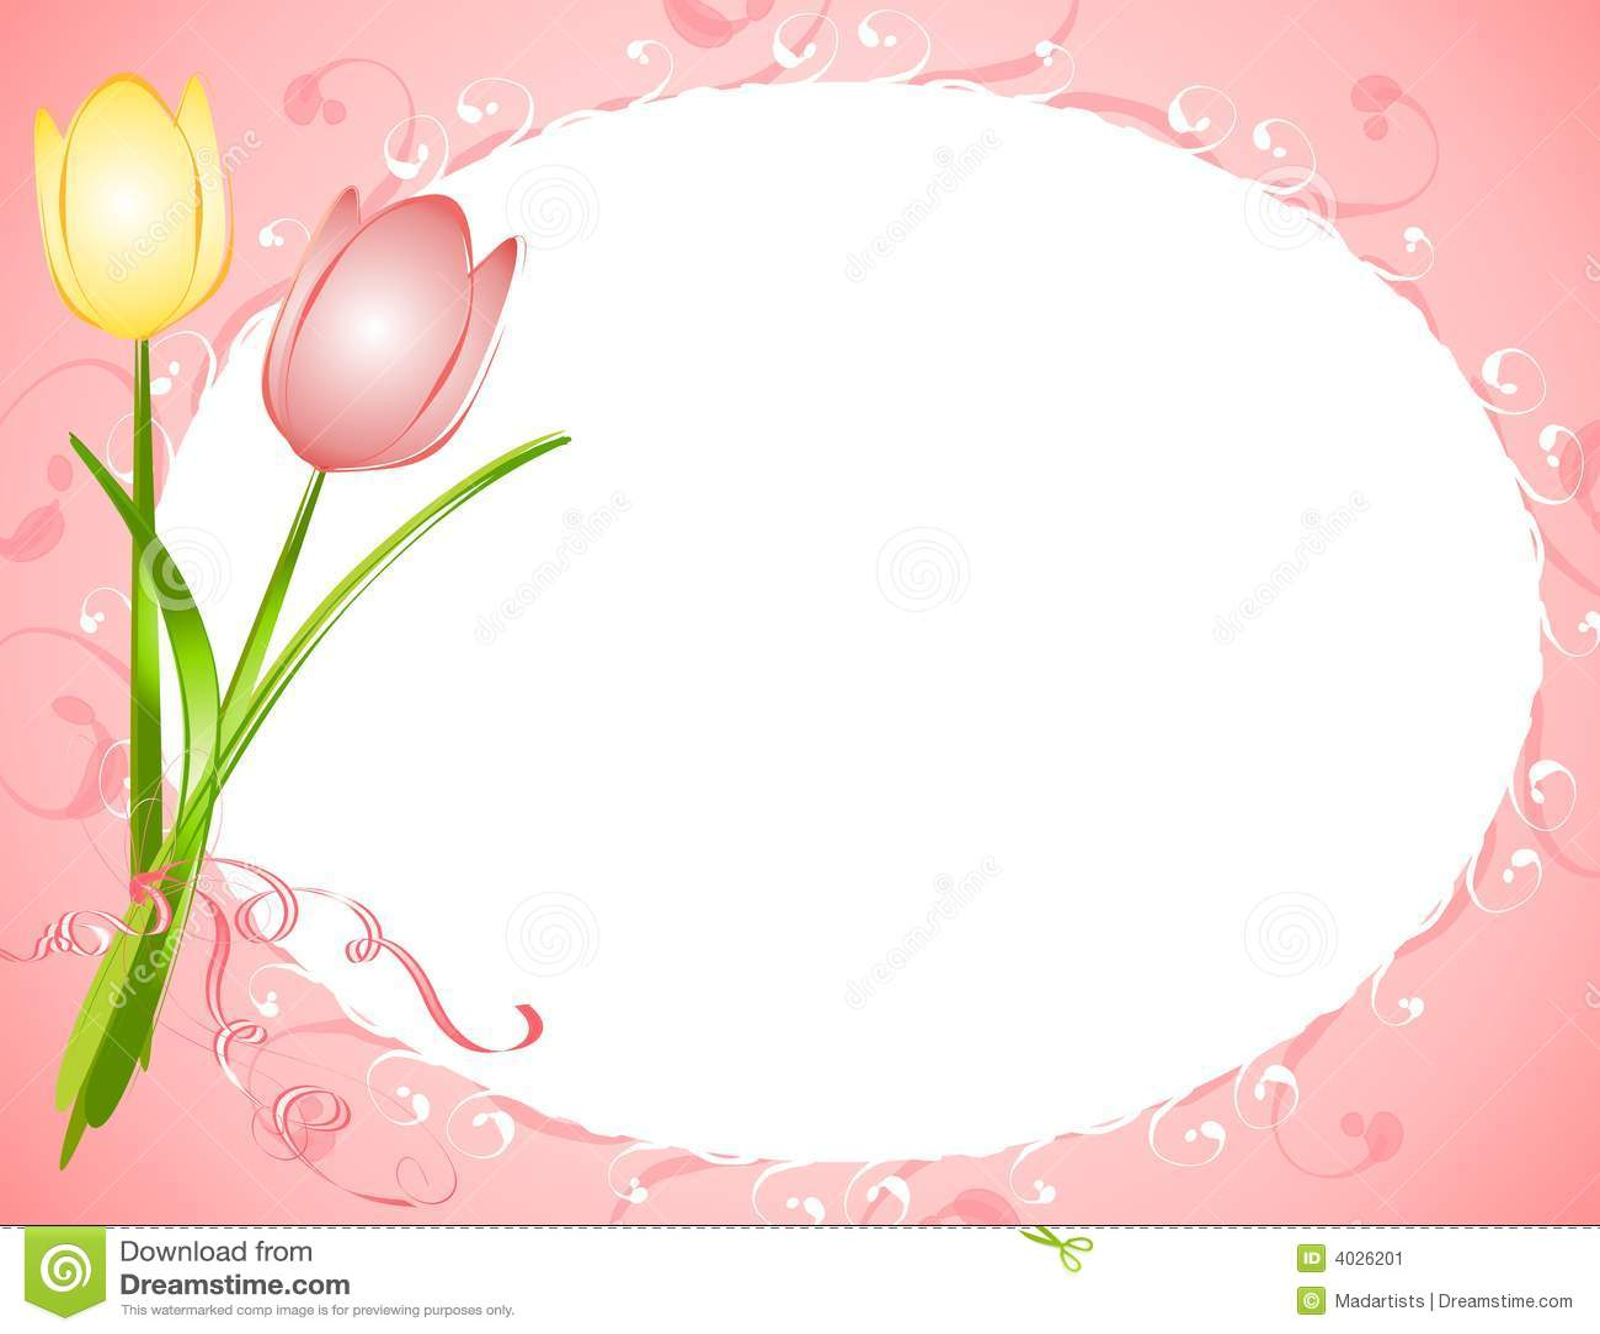 Pink oval tulips flower frame border stock illustration pink oval tulips flower frame border thecheapjerseys Images